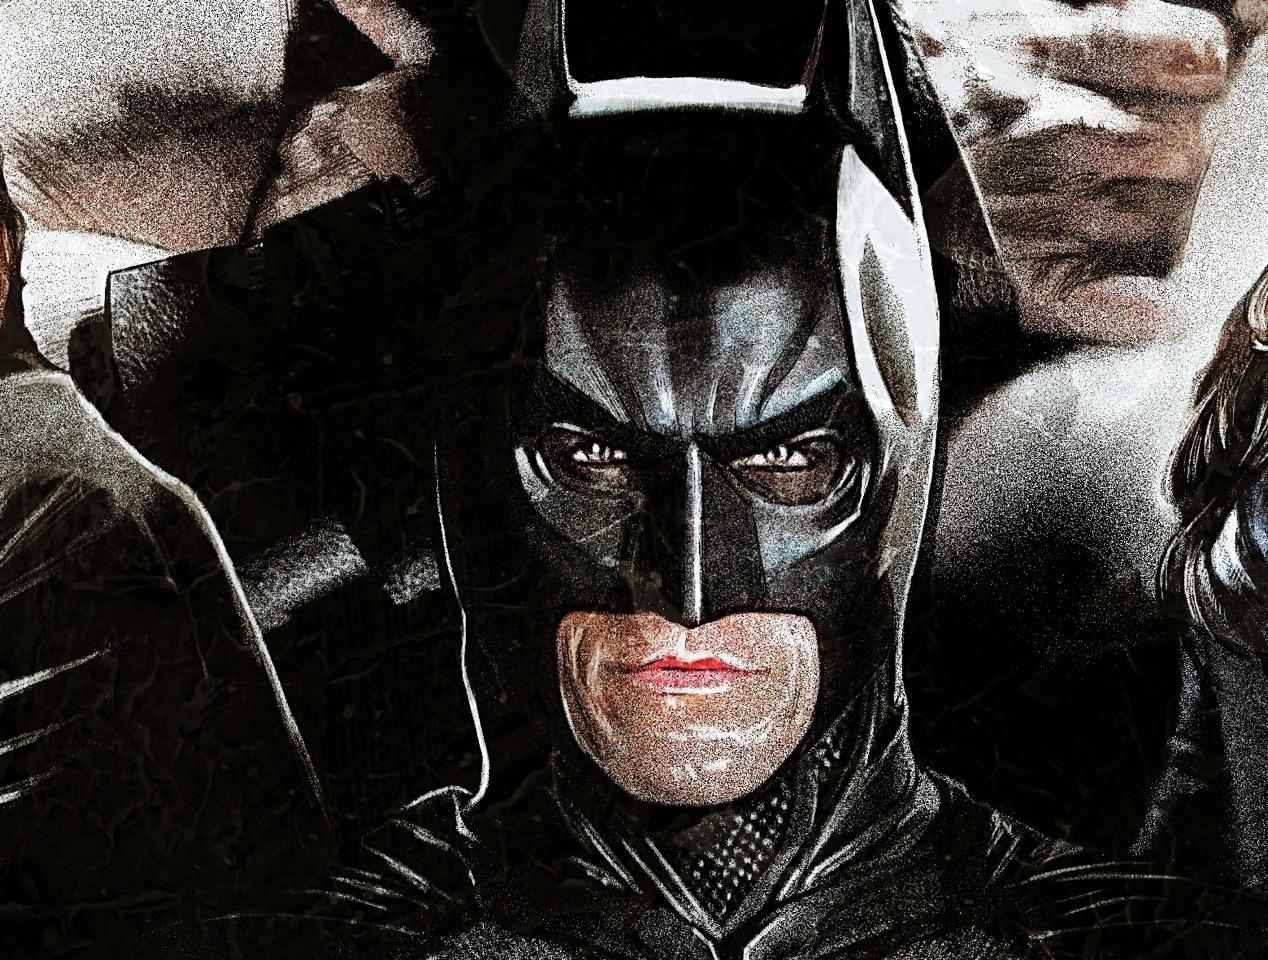 Dark Knight Rises Poster Artwork - 2 different styles